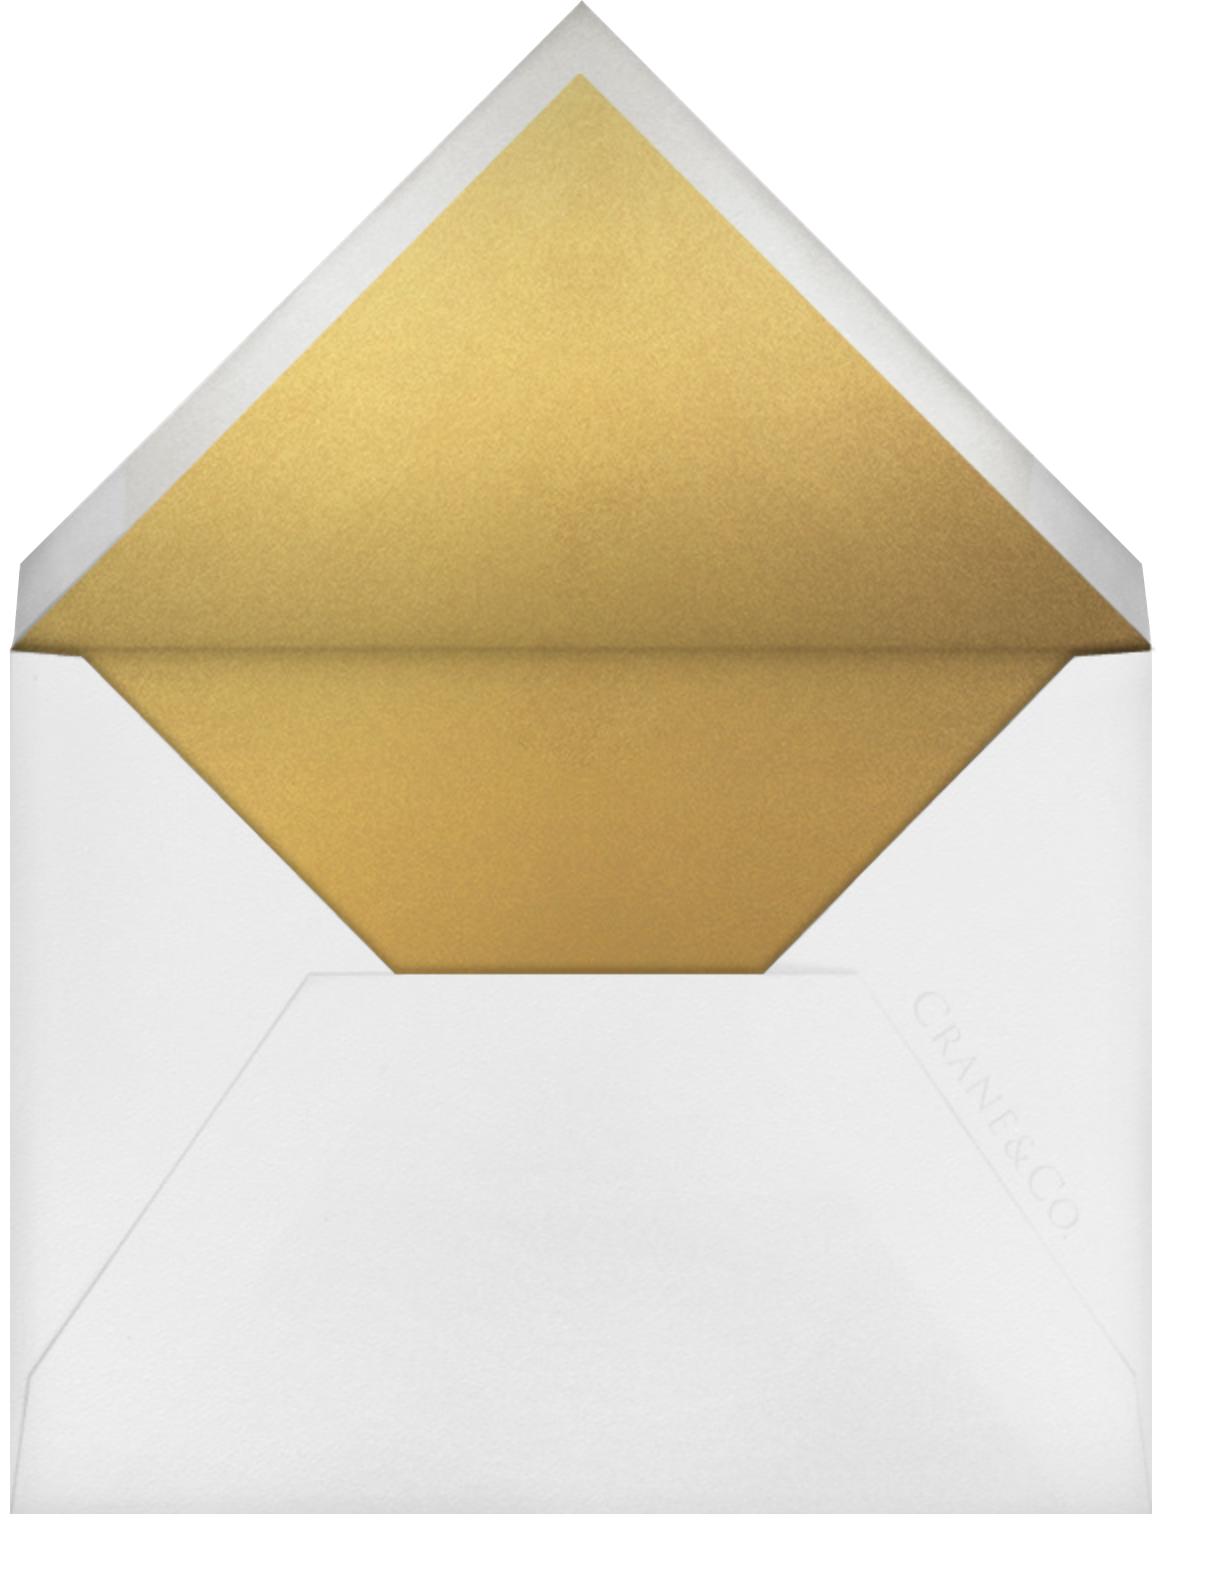 Vernal Imprint (Invitation) - Gold - Oscar de la Renta - All - envelope back